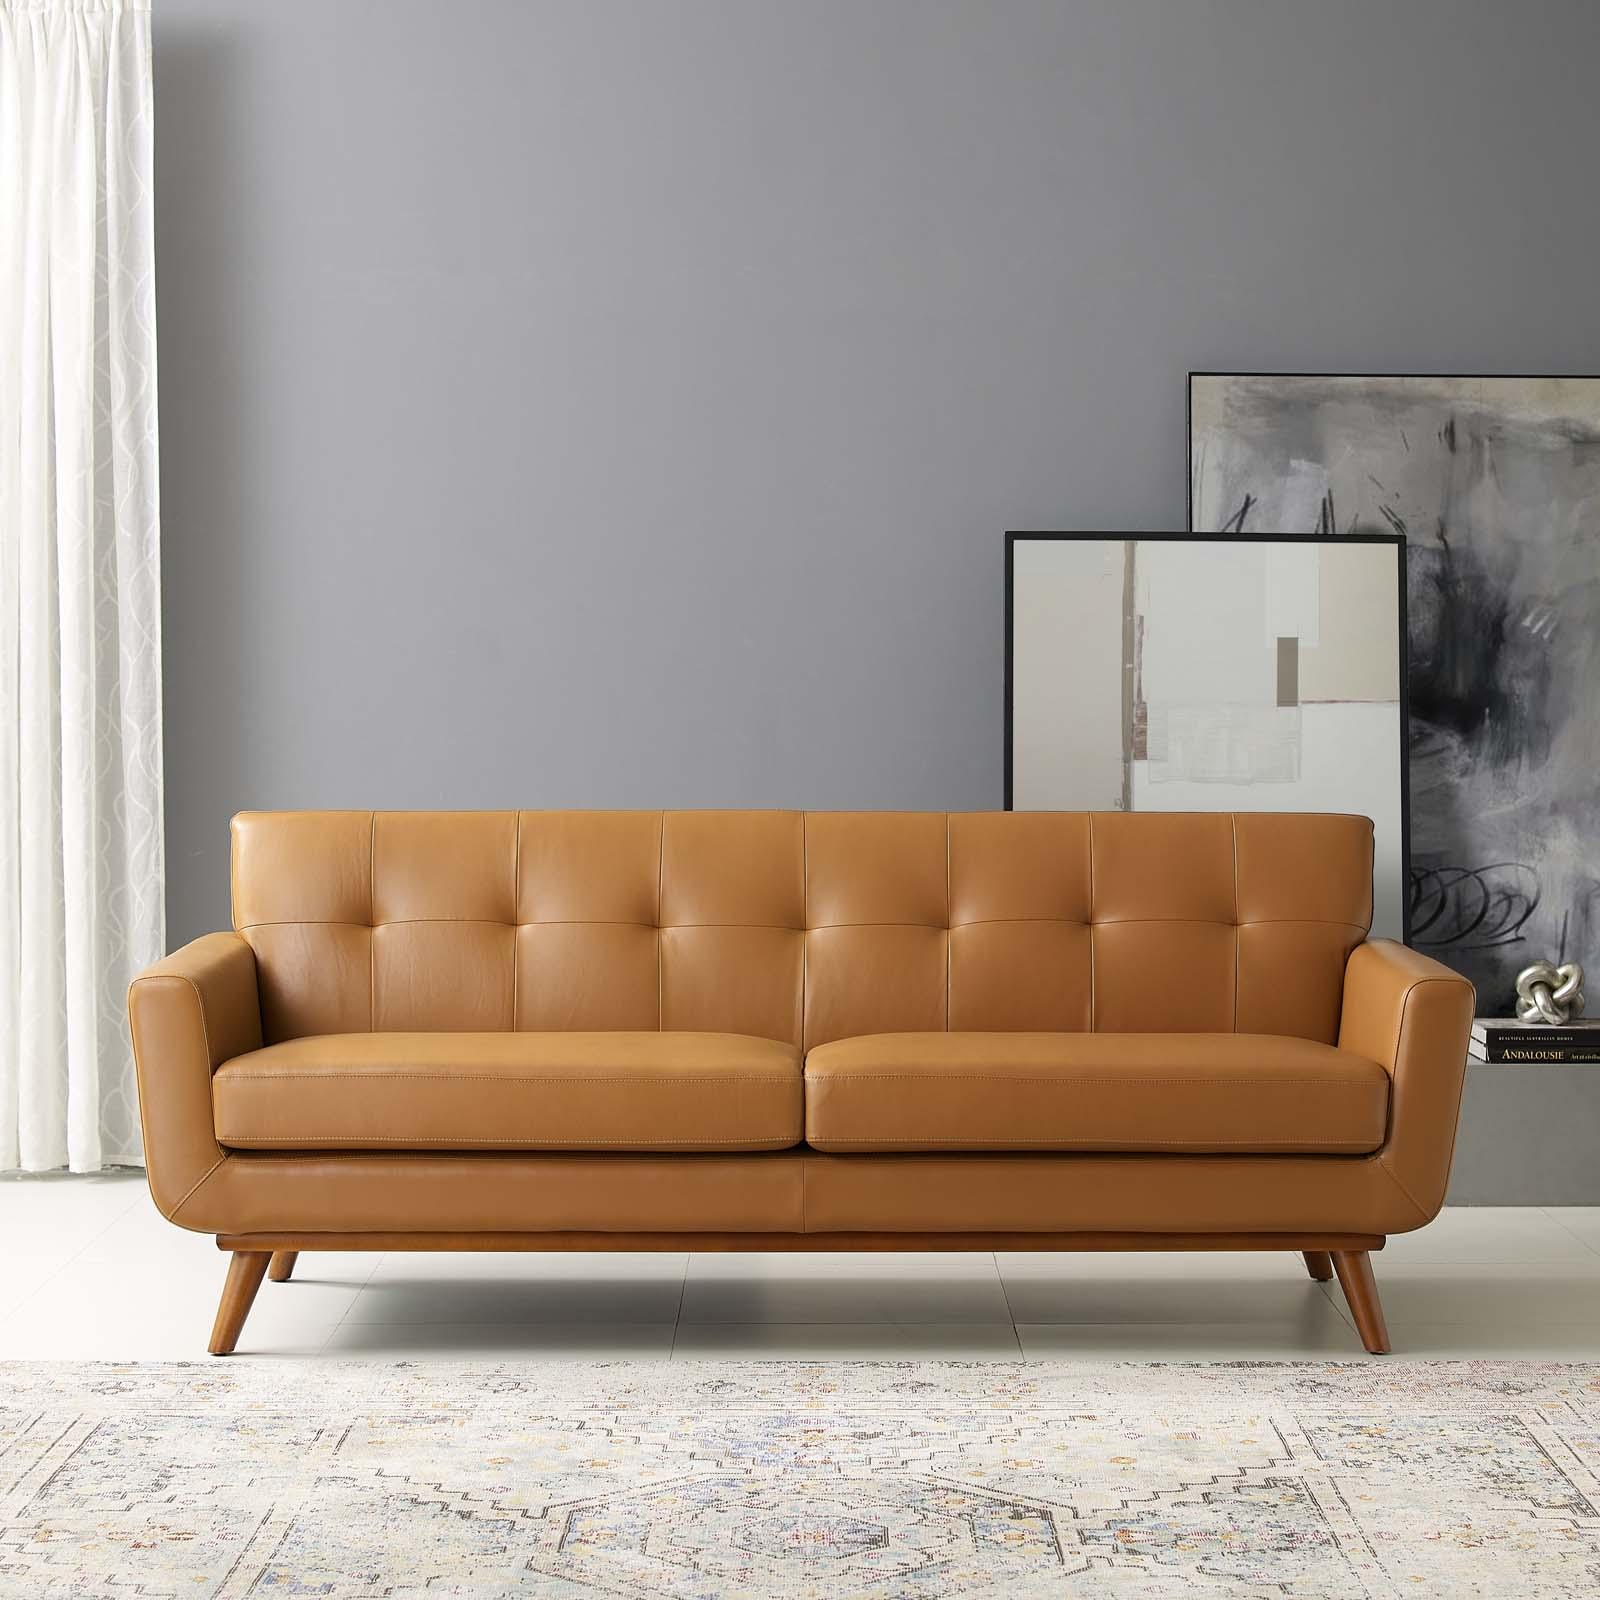 engage topgrain leather living room lounge sofa tan